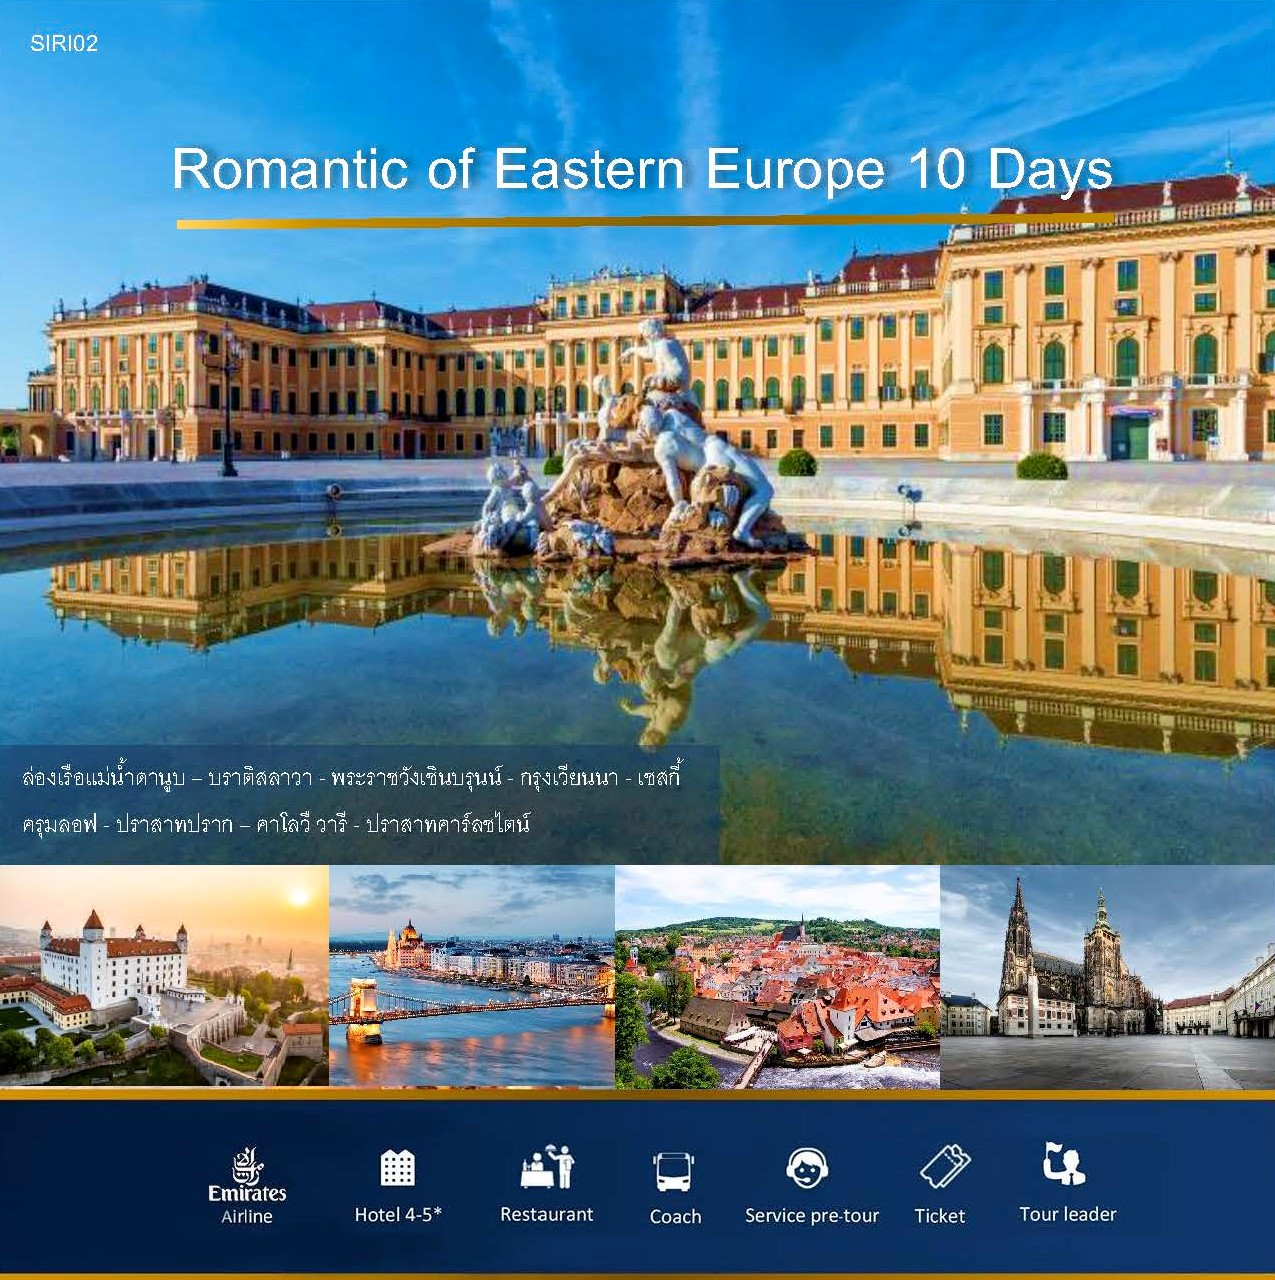 Romantic of Eastern Europe